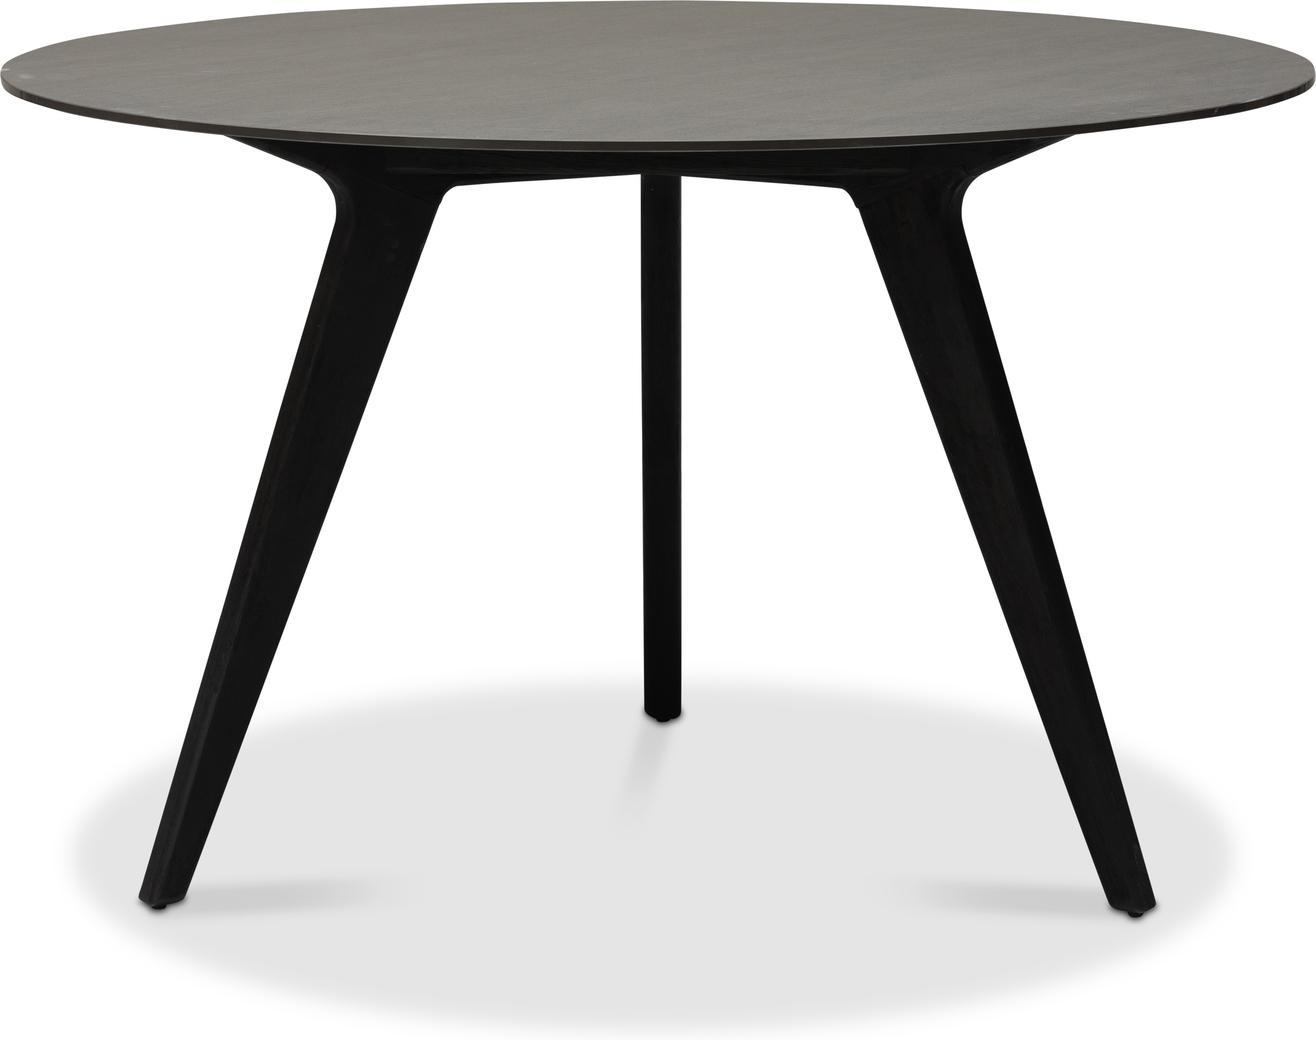 Torsa High dining table - Teak nero - CK 148